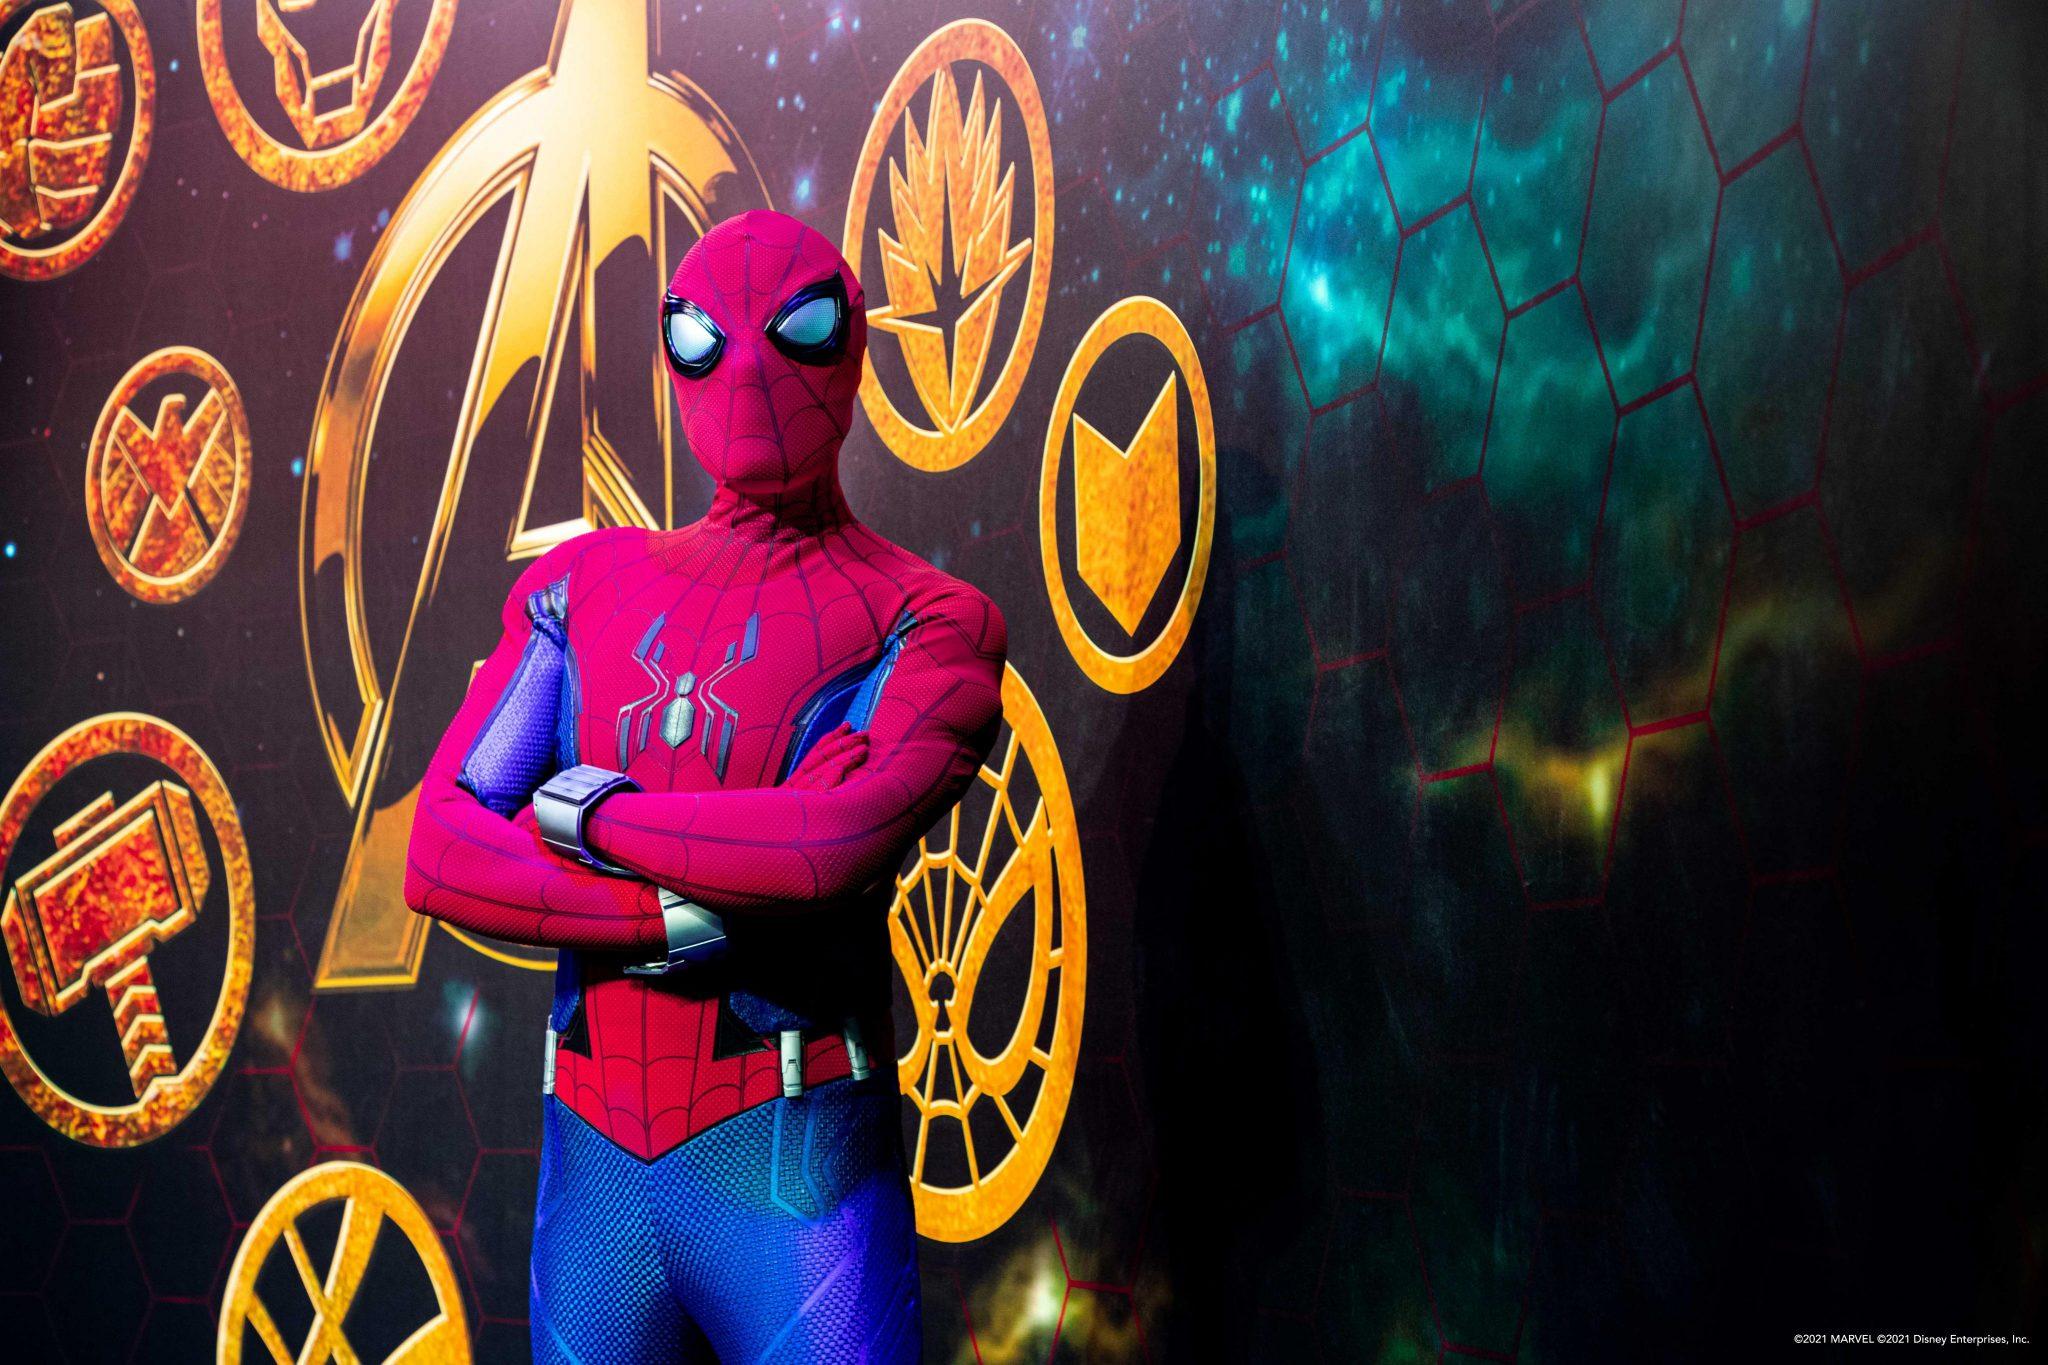 disney hotel new york art of marvel paris images disneyland réouverture spiderman